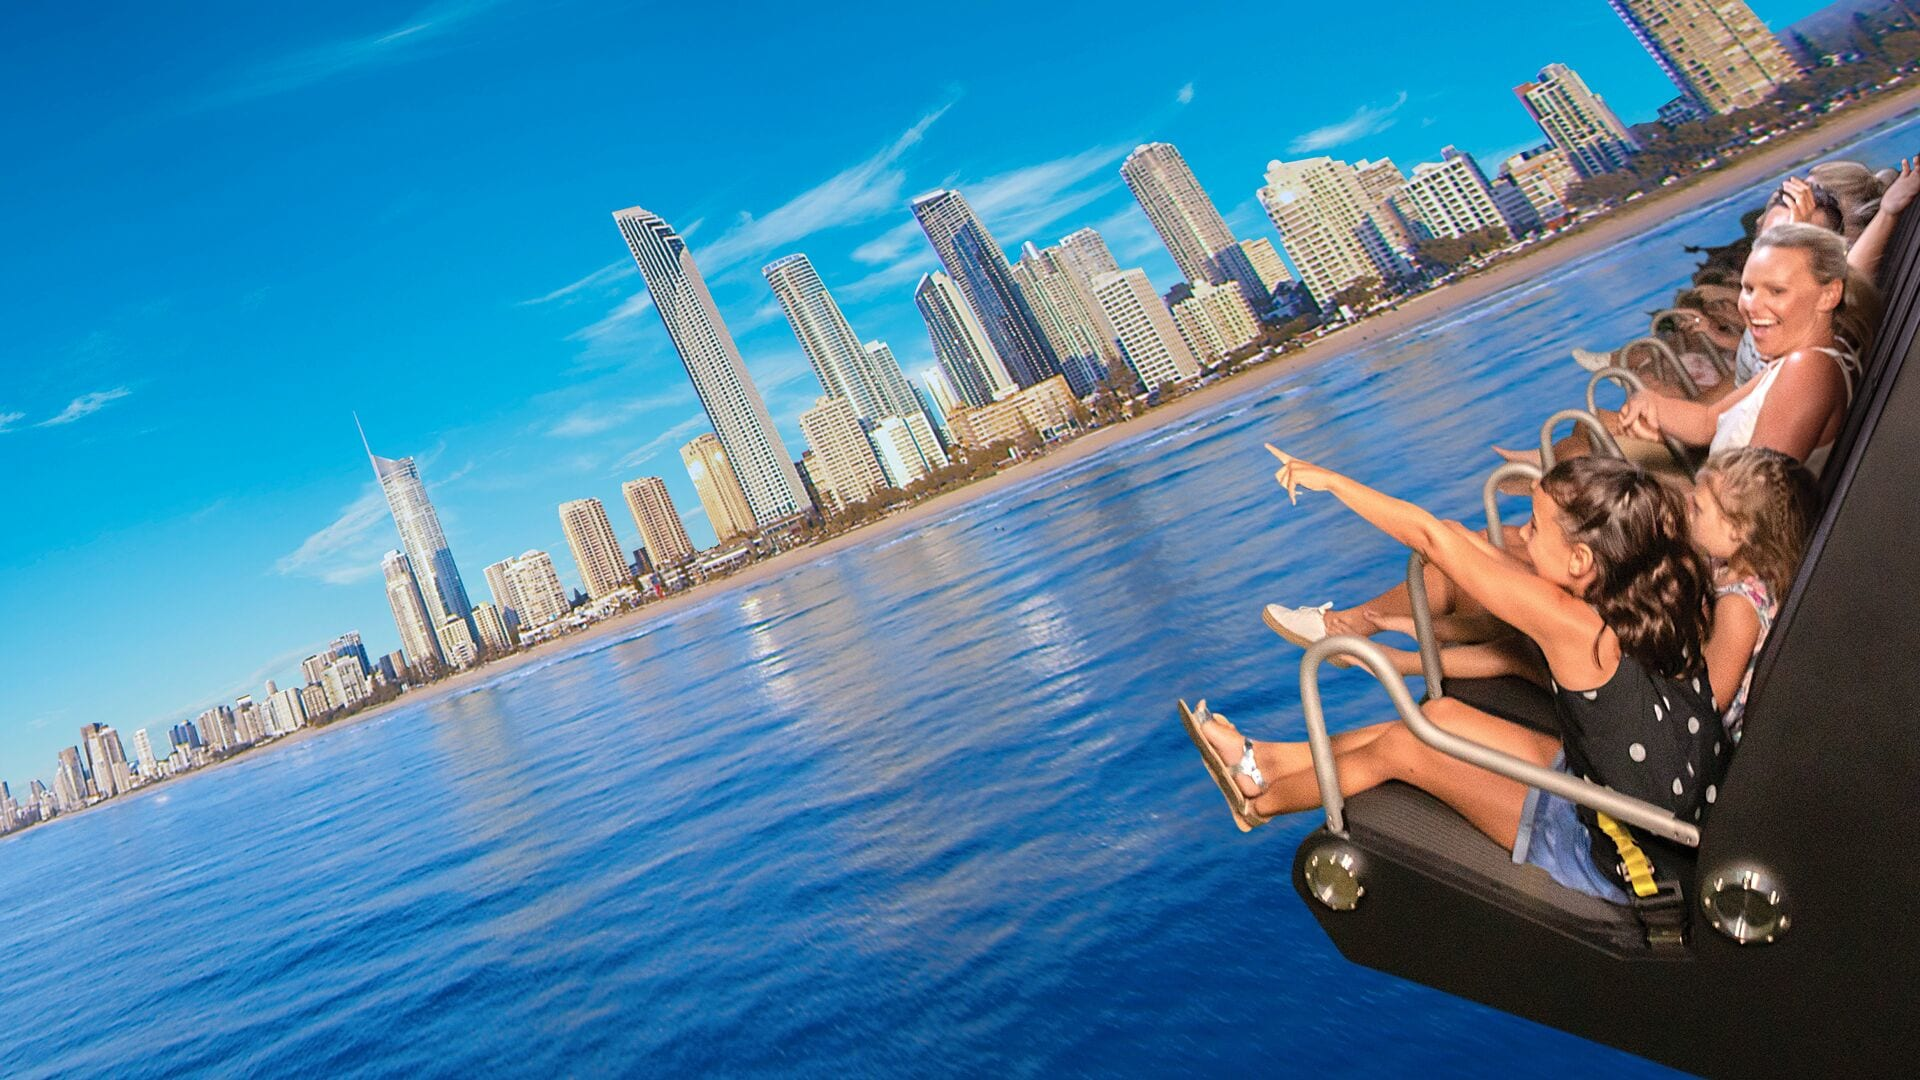 Dreamworld, WhiteWater World, SkyPoint Observation Deck, 3 Day Ticket - Gold Coast